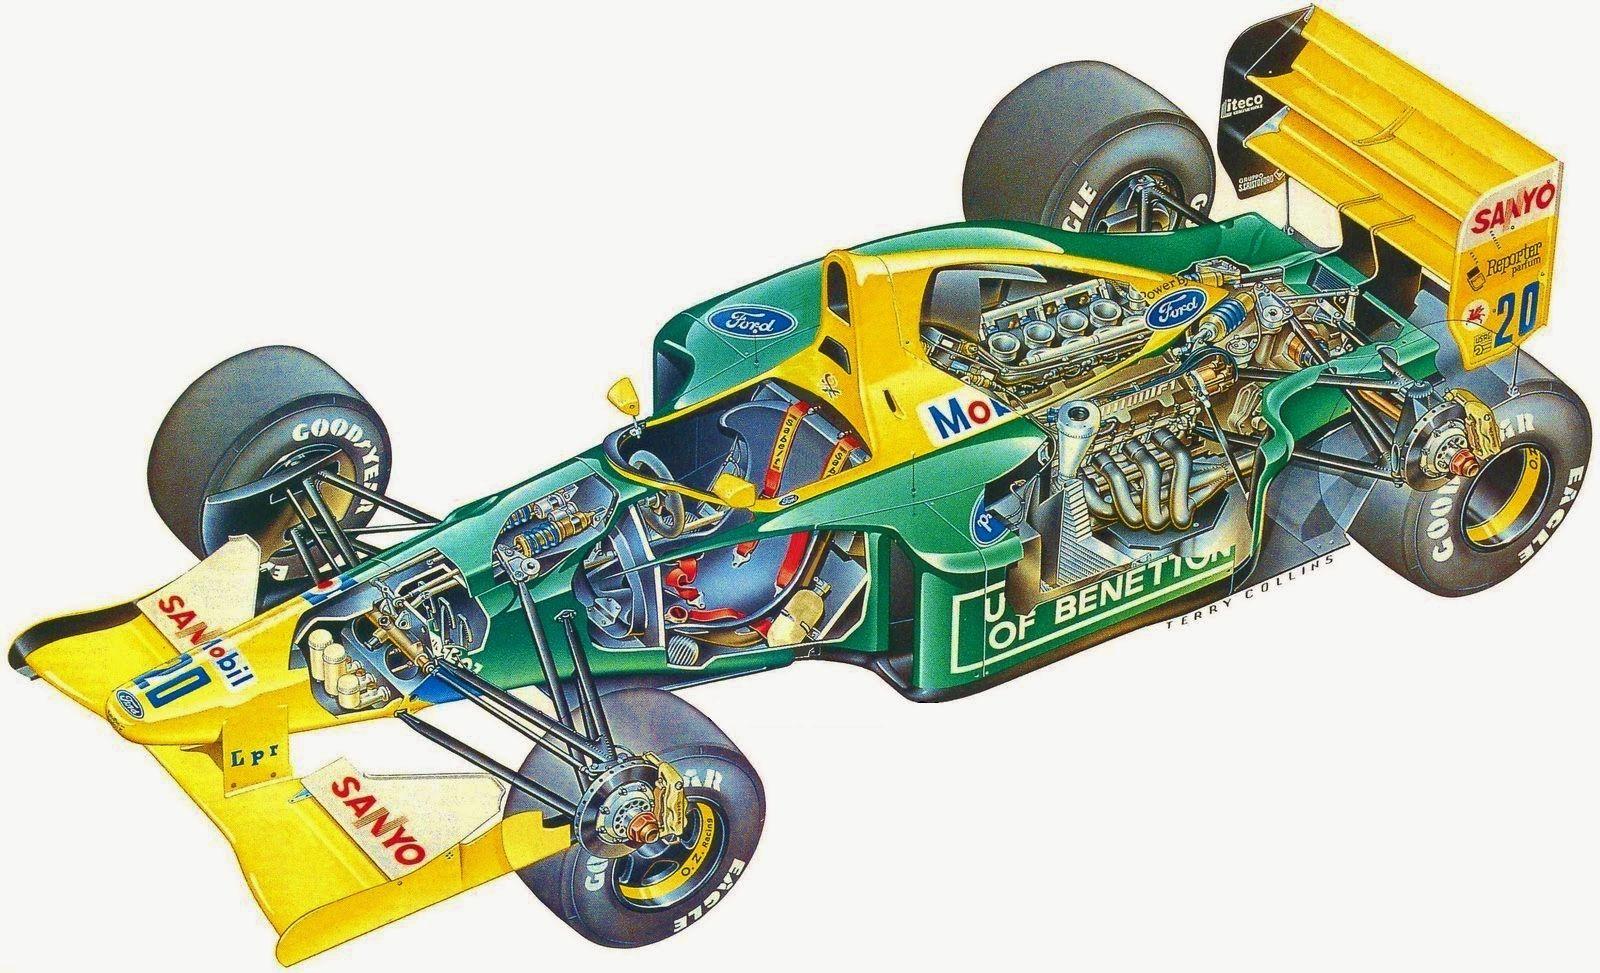 Pin by Gluefinger on Tamiya 1/20 B192 Indy cars